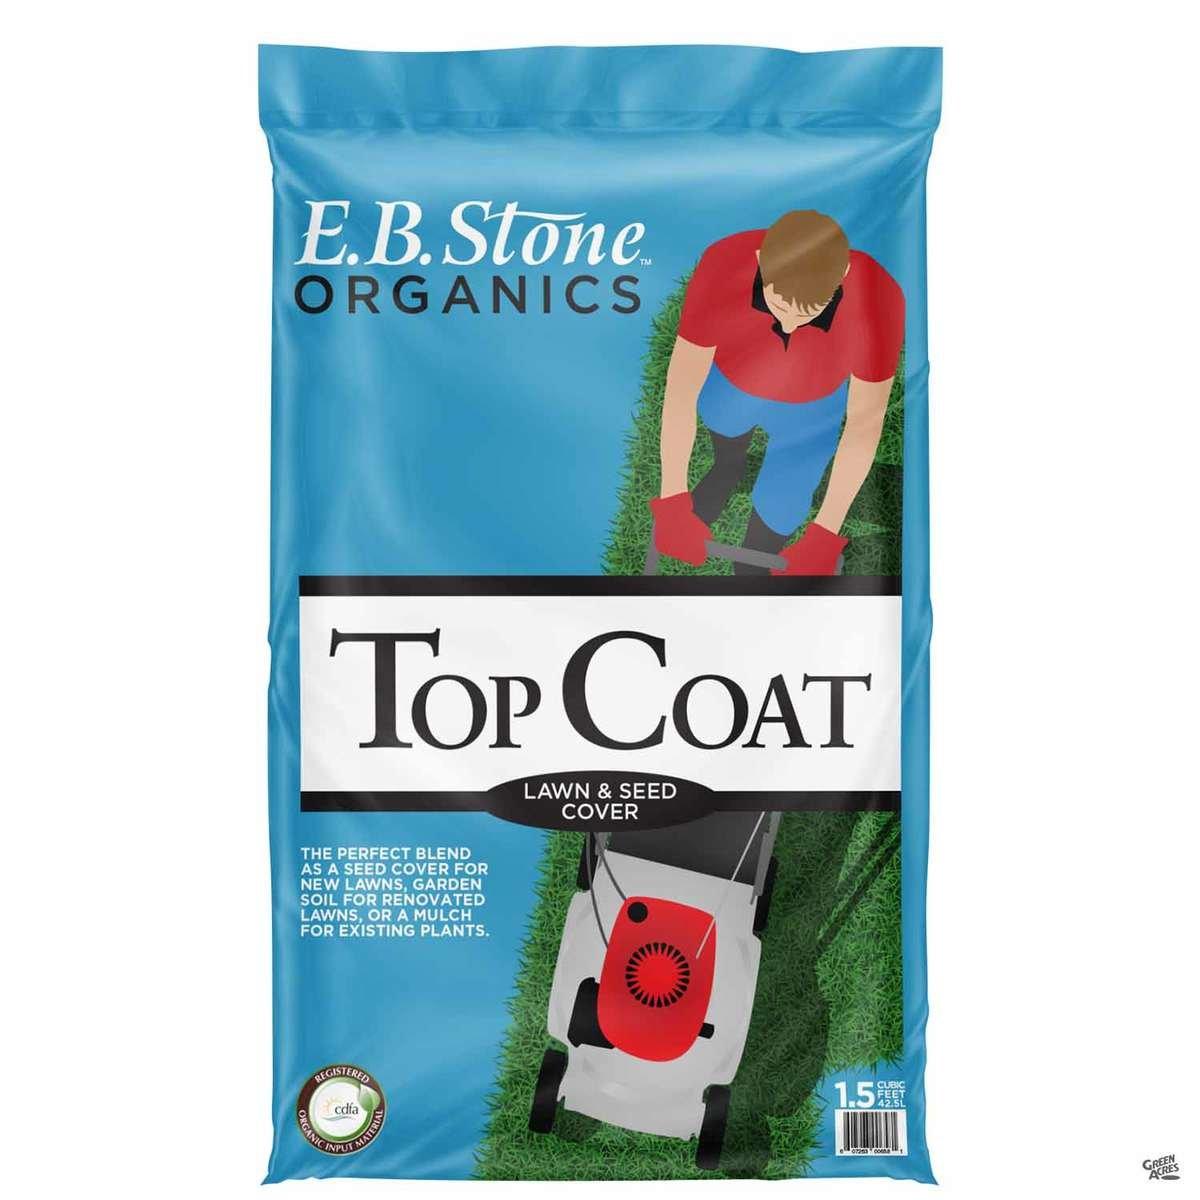 E.B. Stone™ Organics Top Coat Lawn & Seed Cover